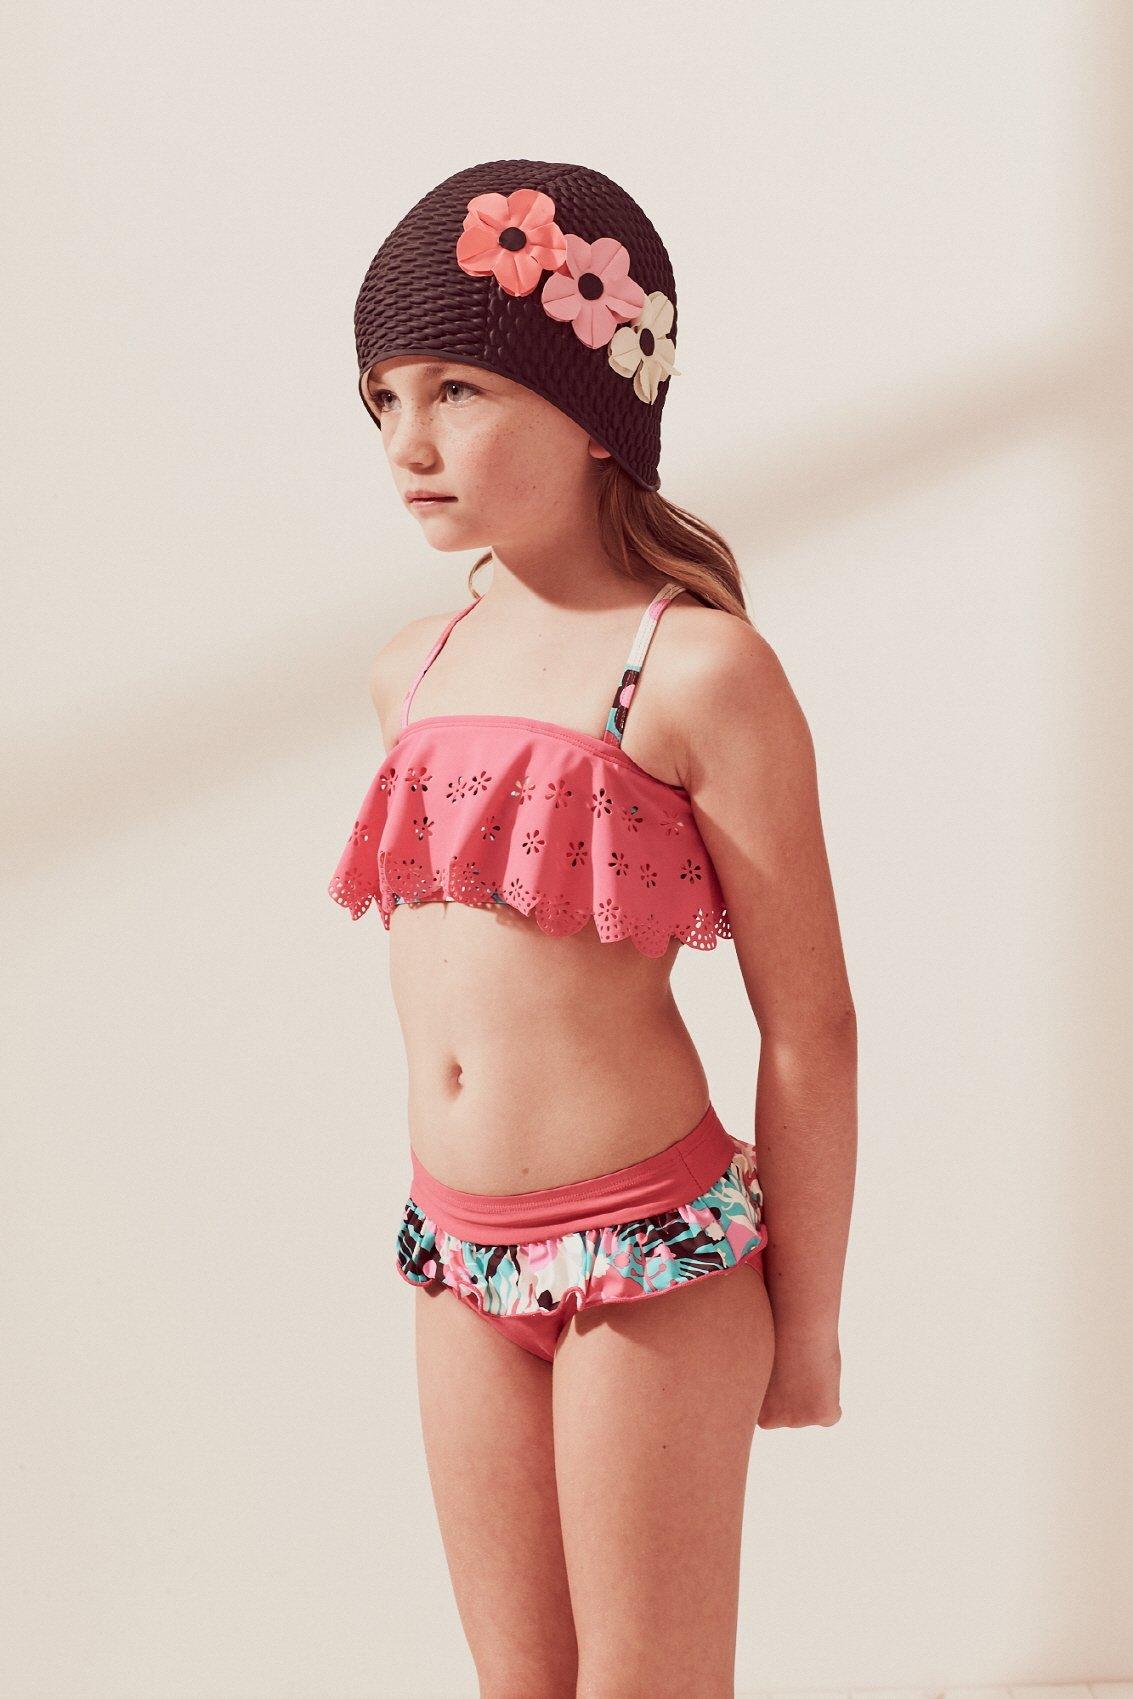 Young little girls bikini